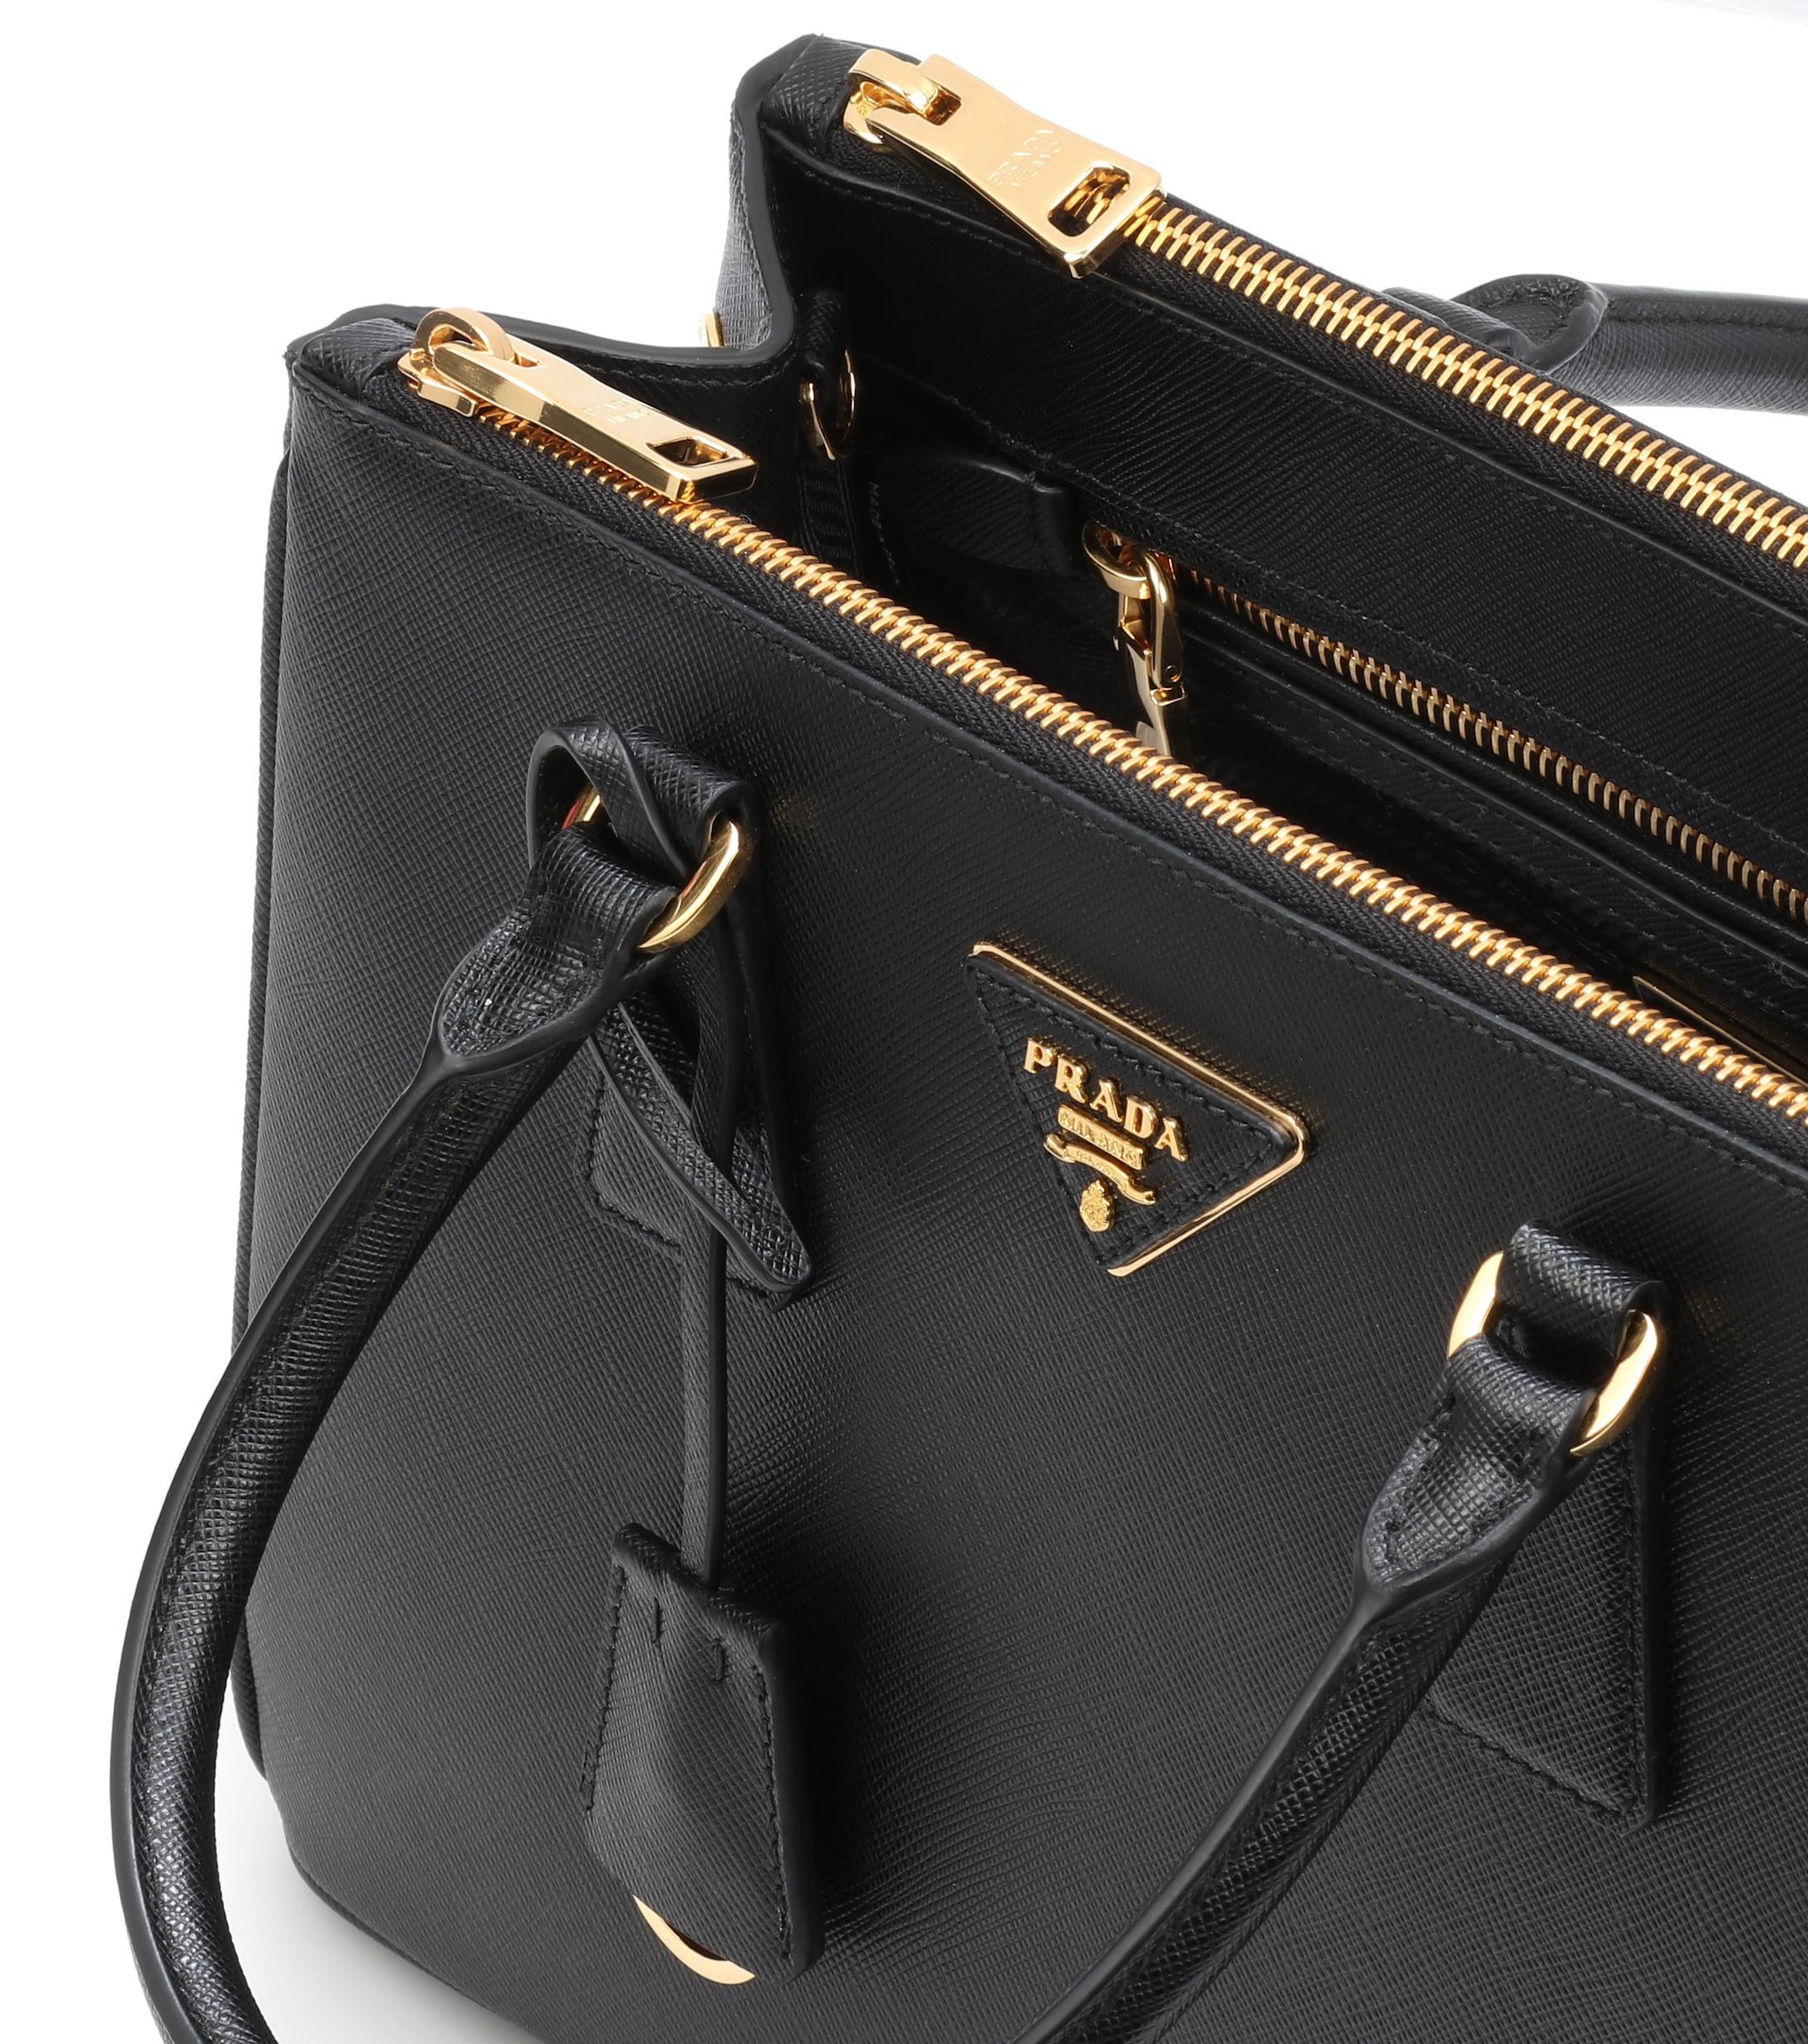 d9ec77d0df0337 Prada Galleria Saffiano Small Leather Shoulder Bag in Black - Lyst